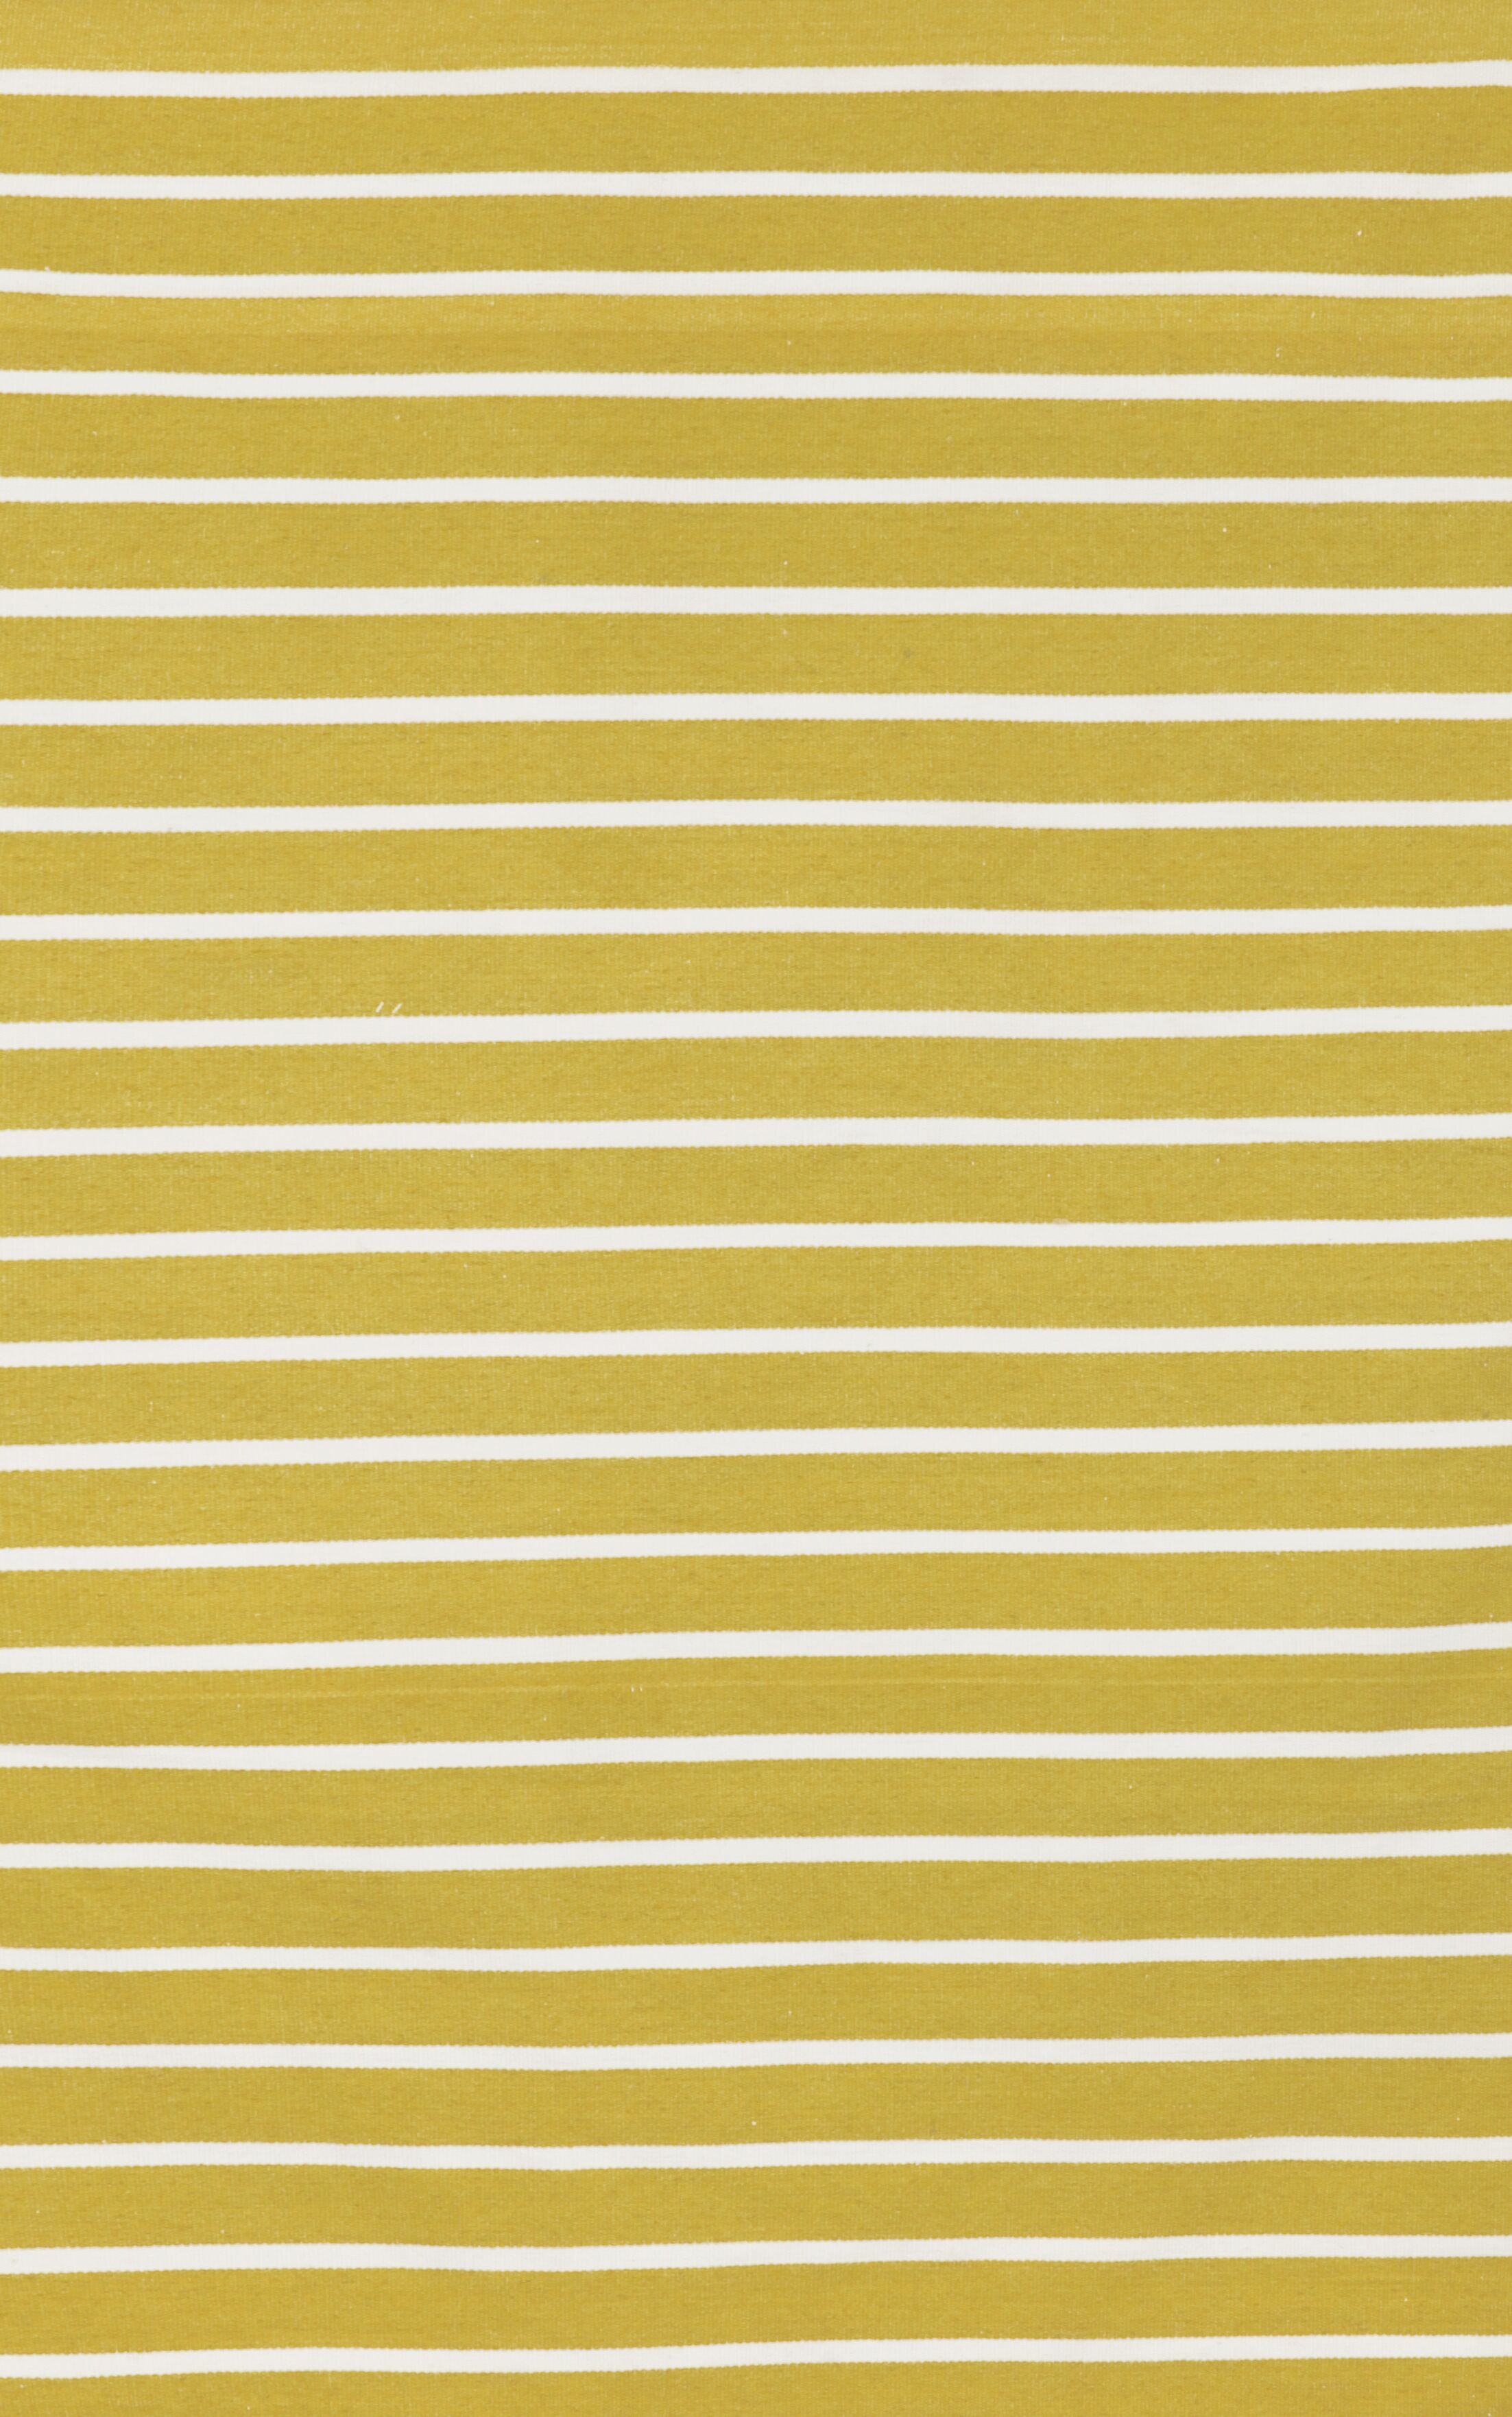 Ranier Pinstripe Hand-Woven Yellow/Ivory Indoor/Outdoor Area Rug Rug Size: Rectangle 7'6